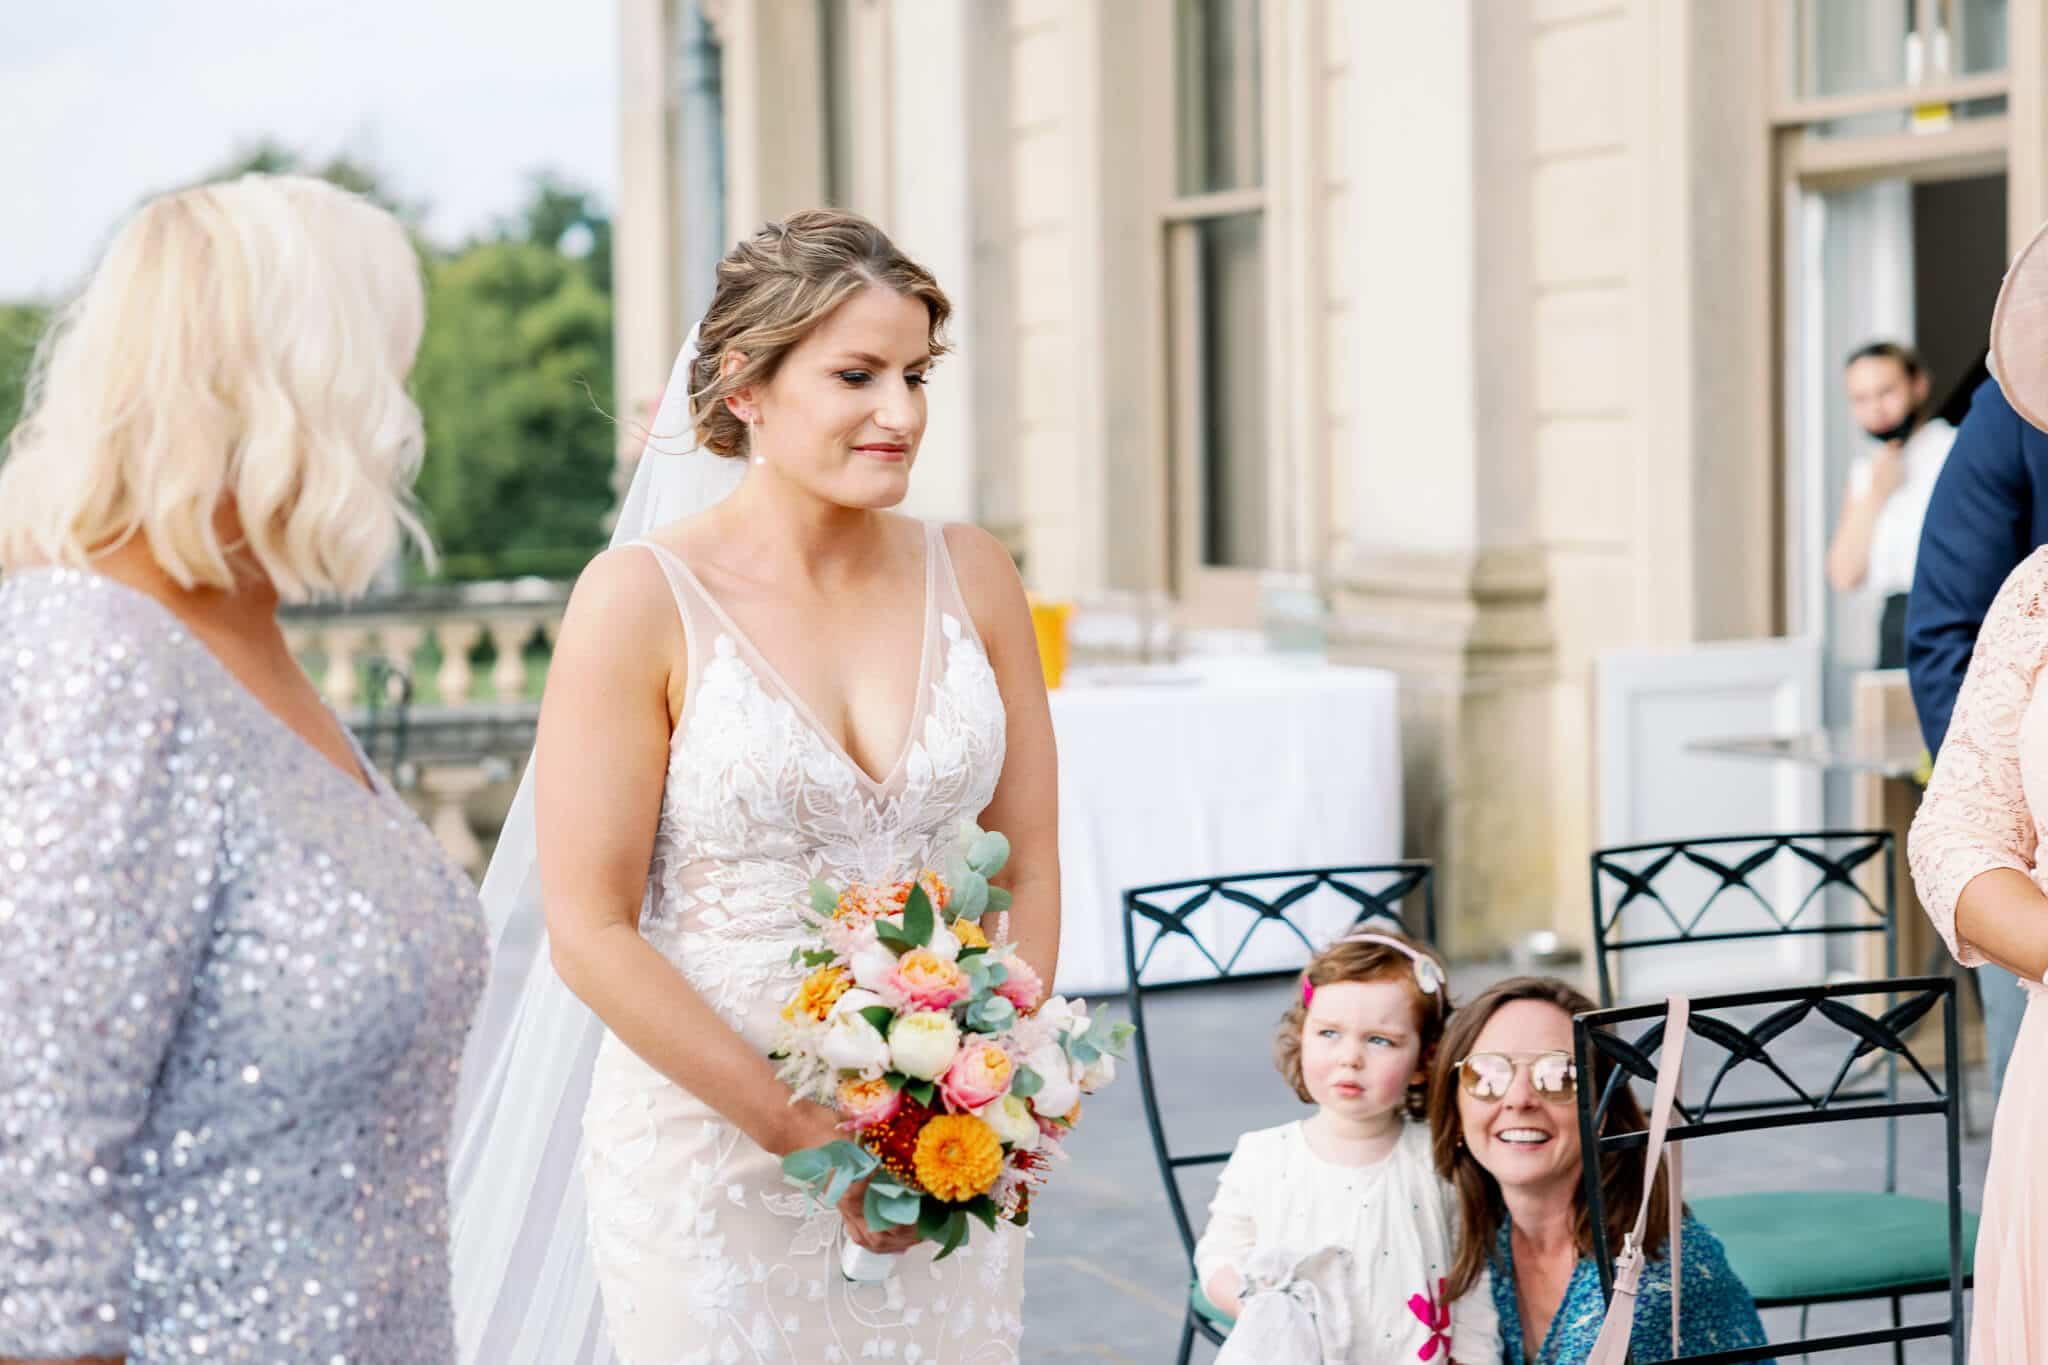 exclusive wedding venues berkshire outdoor wedding ceremony